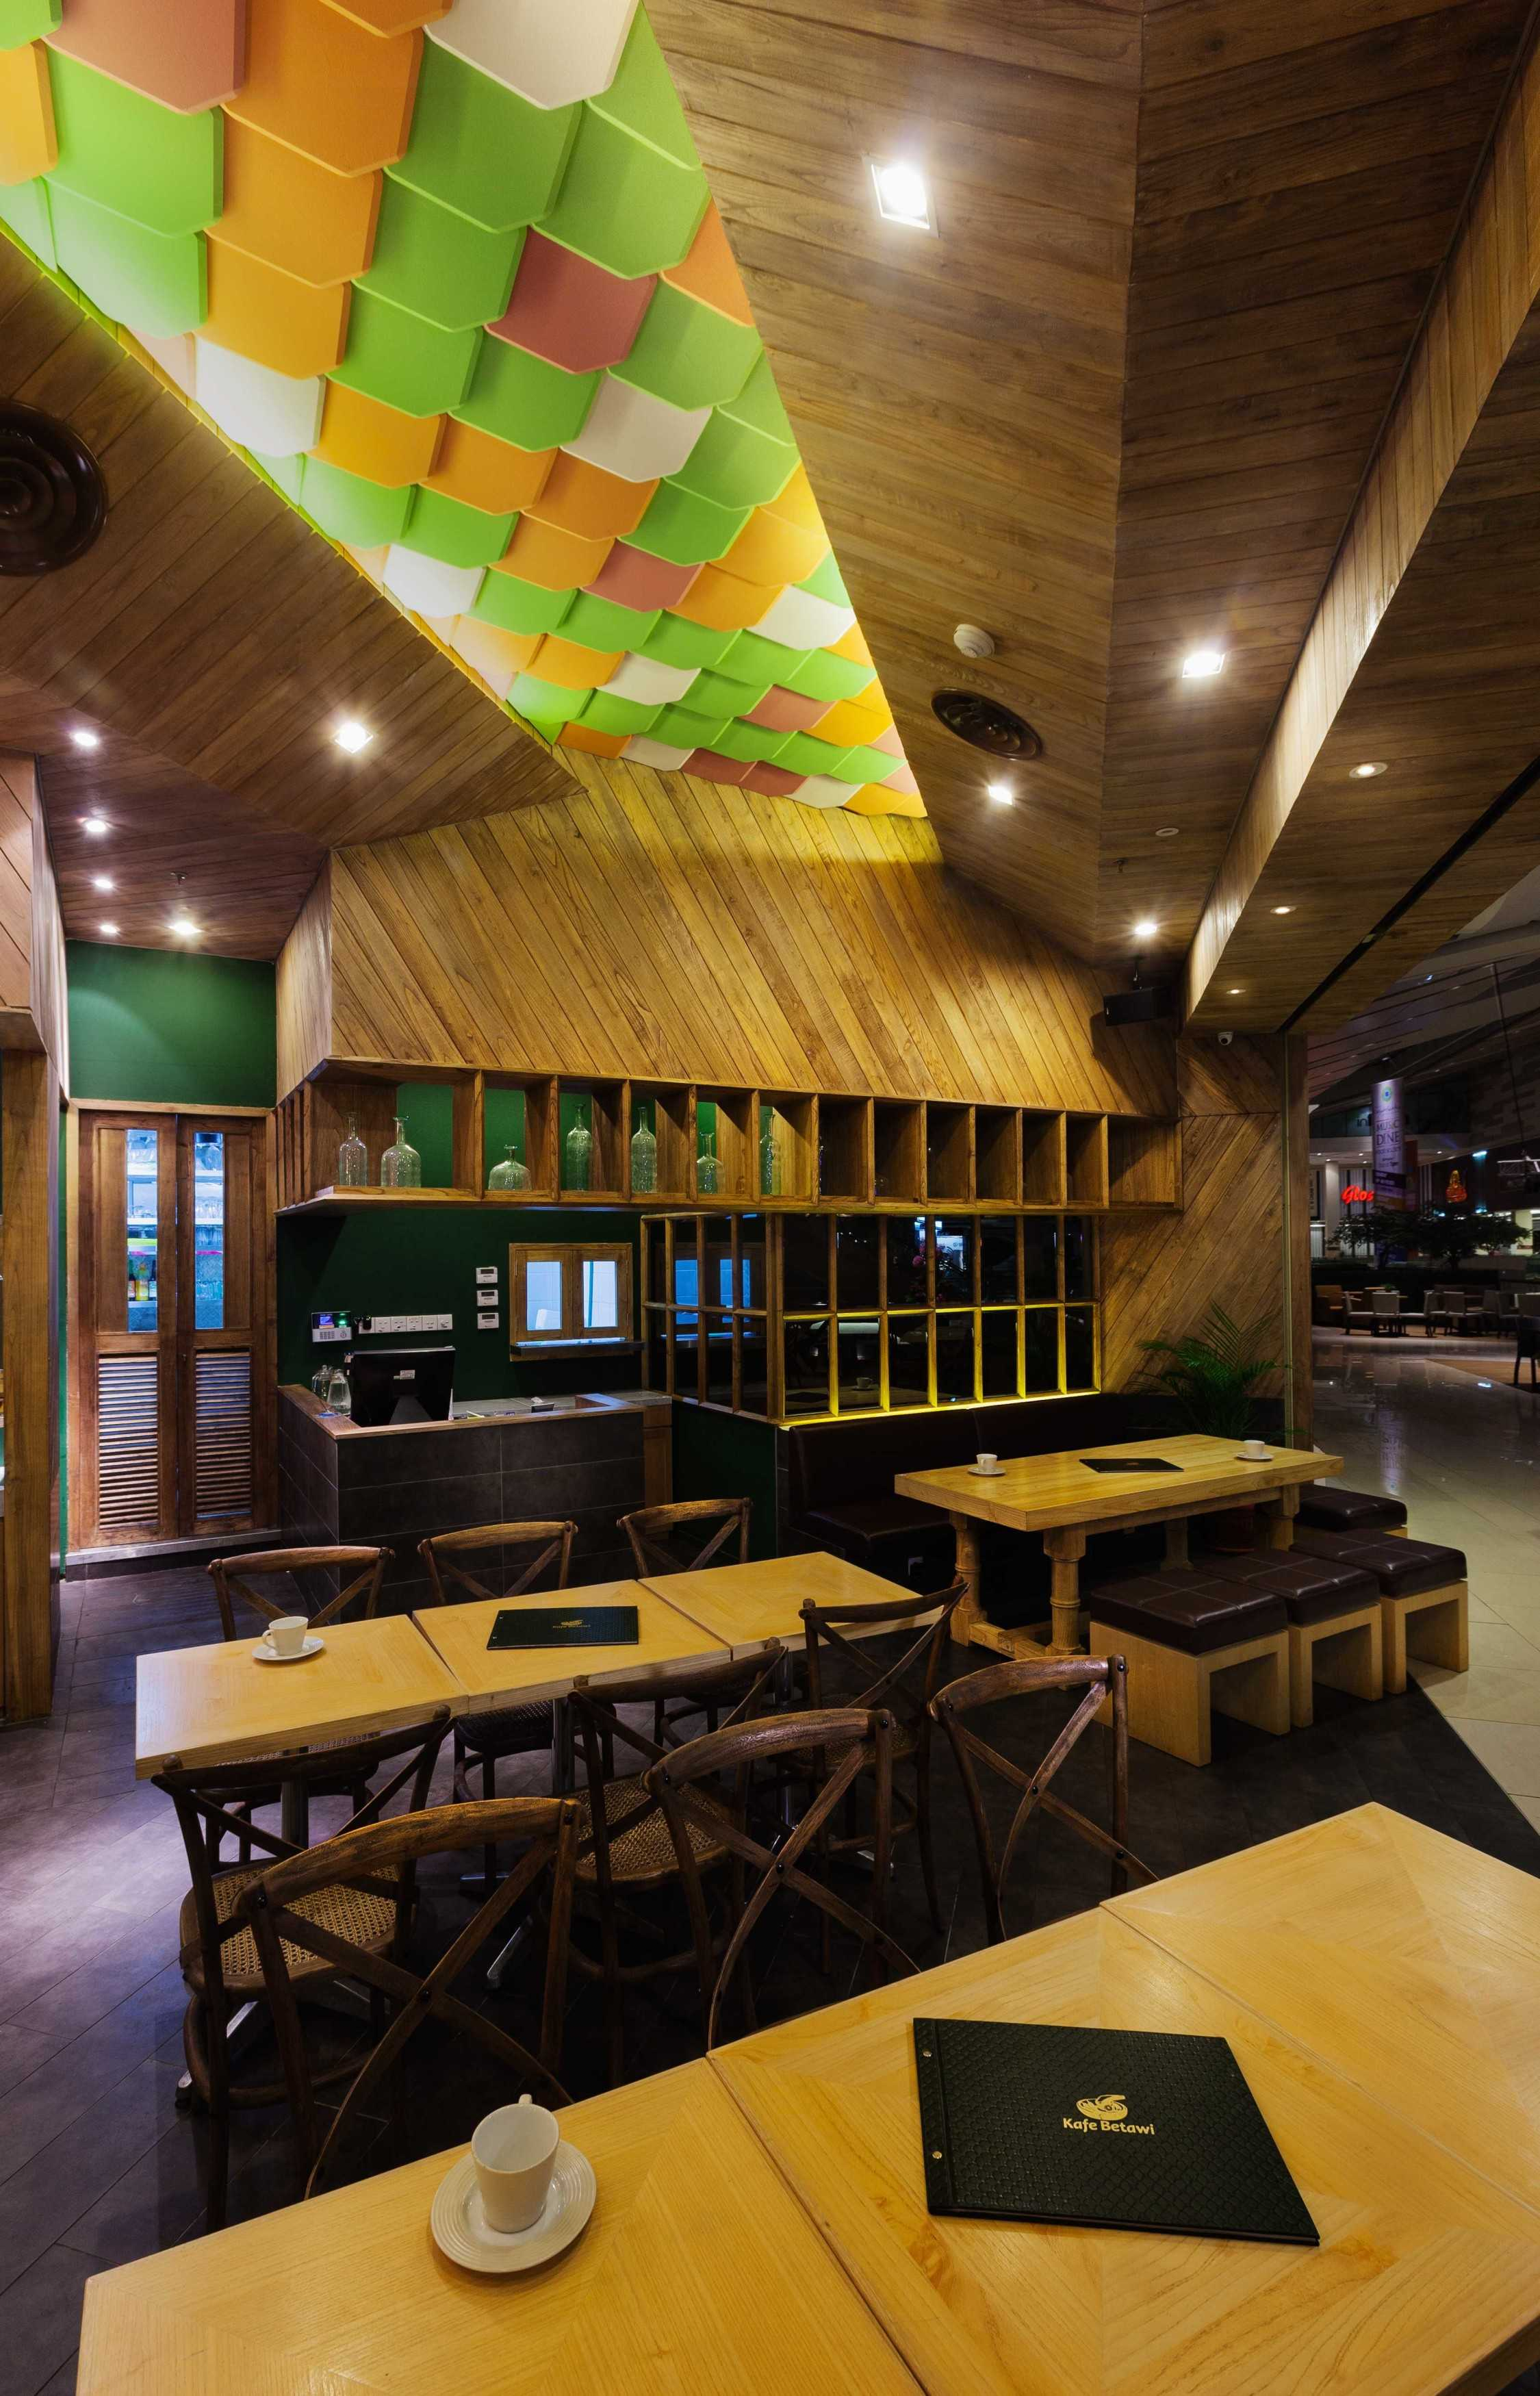 High Street Kafe Betawi Kota Kasablanka, Jakarta Kota Kasablanka, Jakarta Img9019 Tradisional  28743